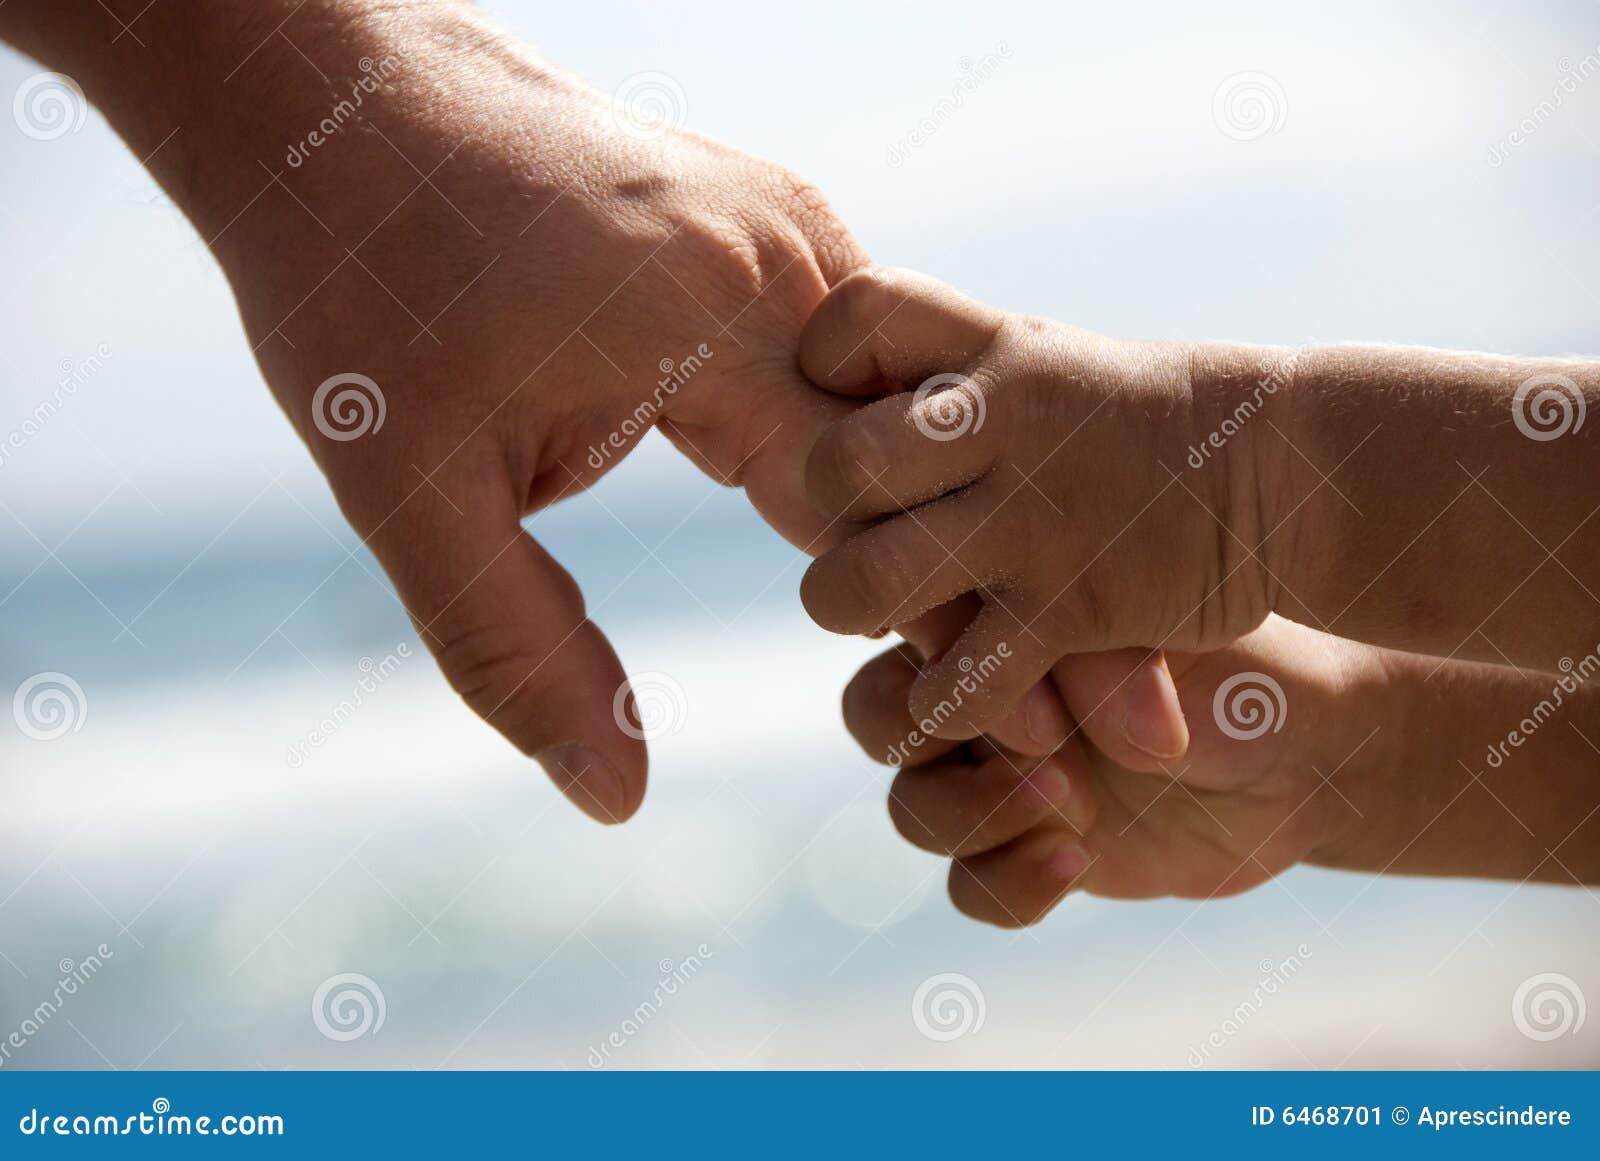 Fadern hands holdingsonen